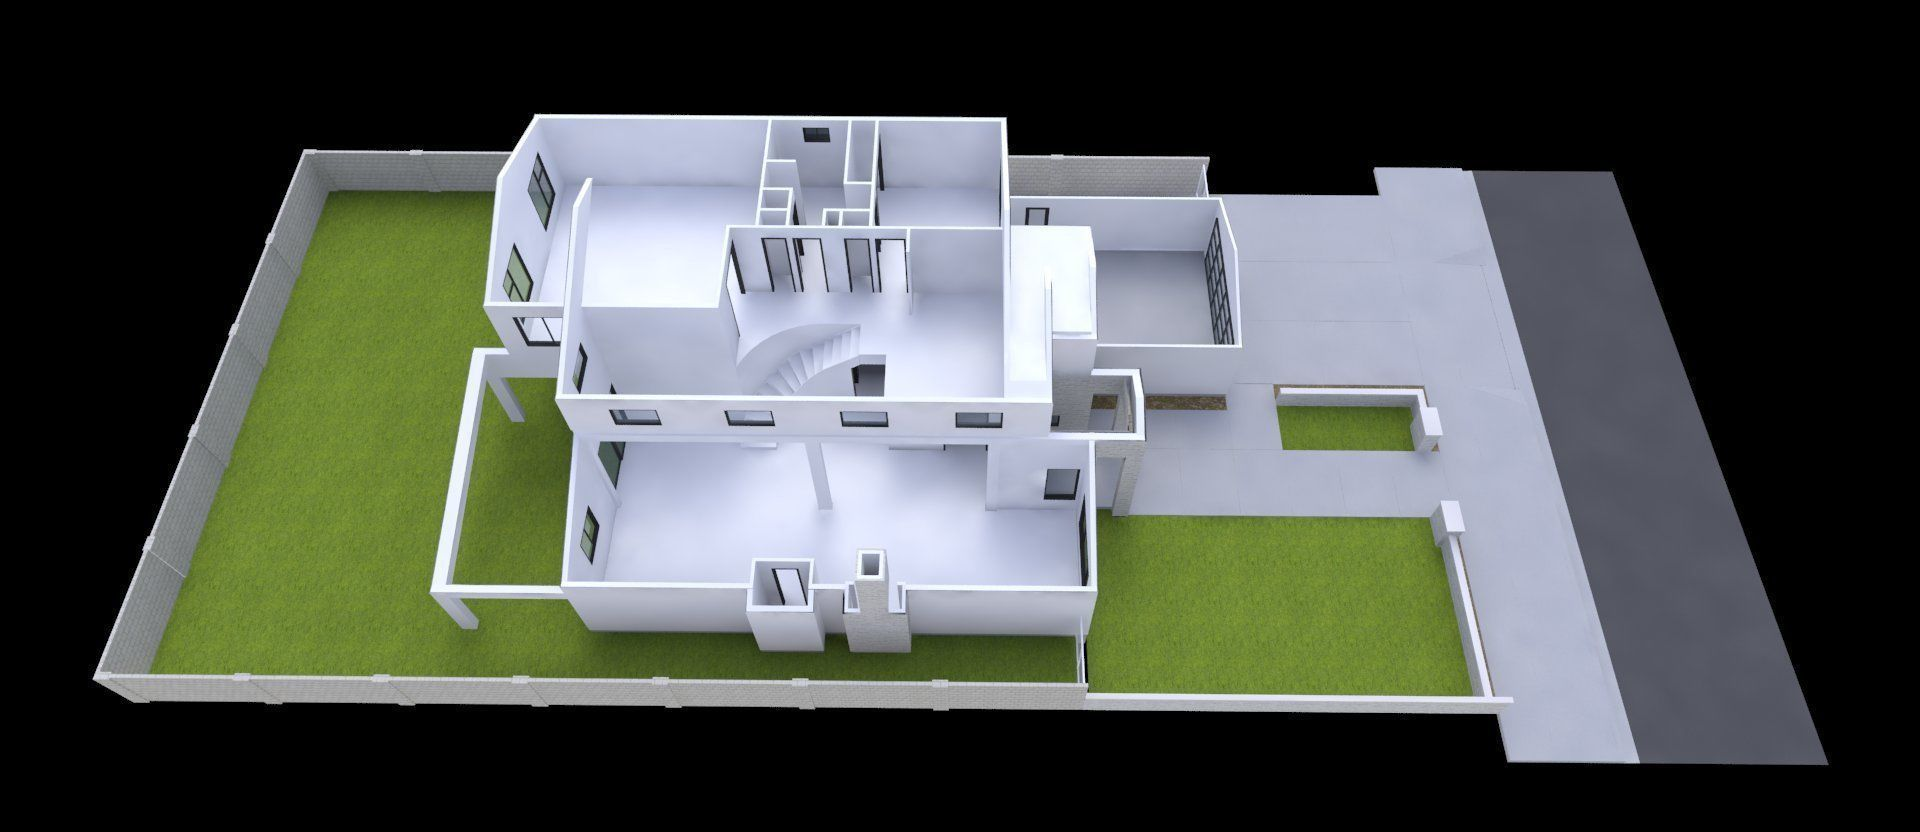 Modern House 2 Story 4 Bedrooms 2 Car Garage 3d Model